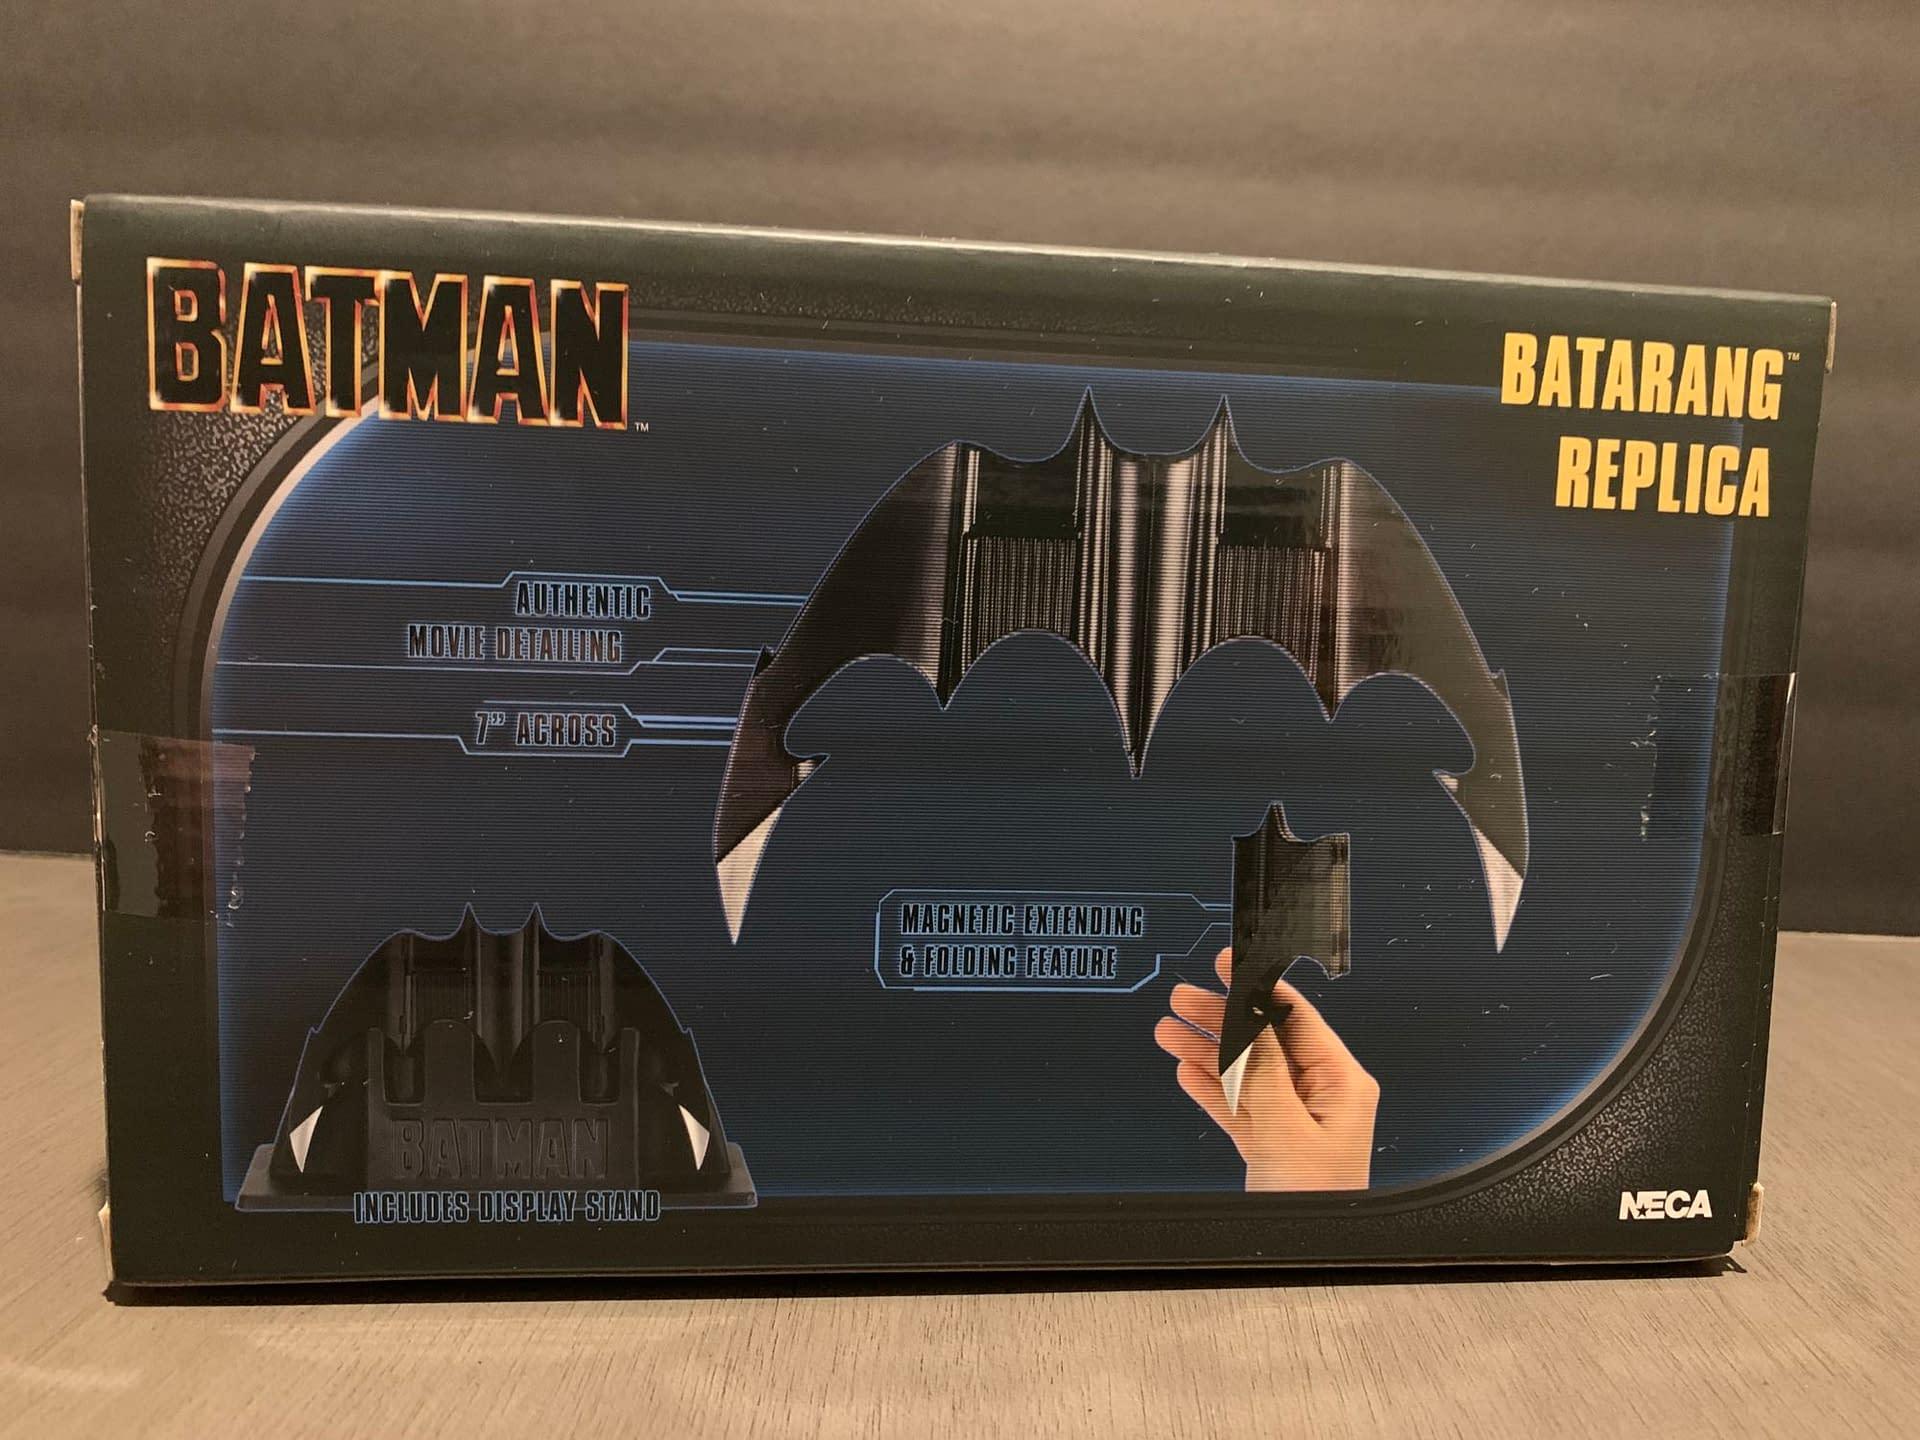 Let's Take A Look At NECA's new Batarang Replica